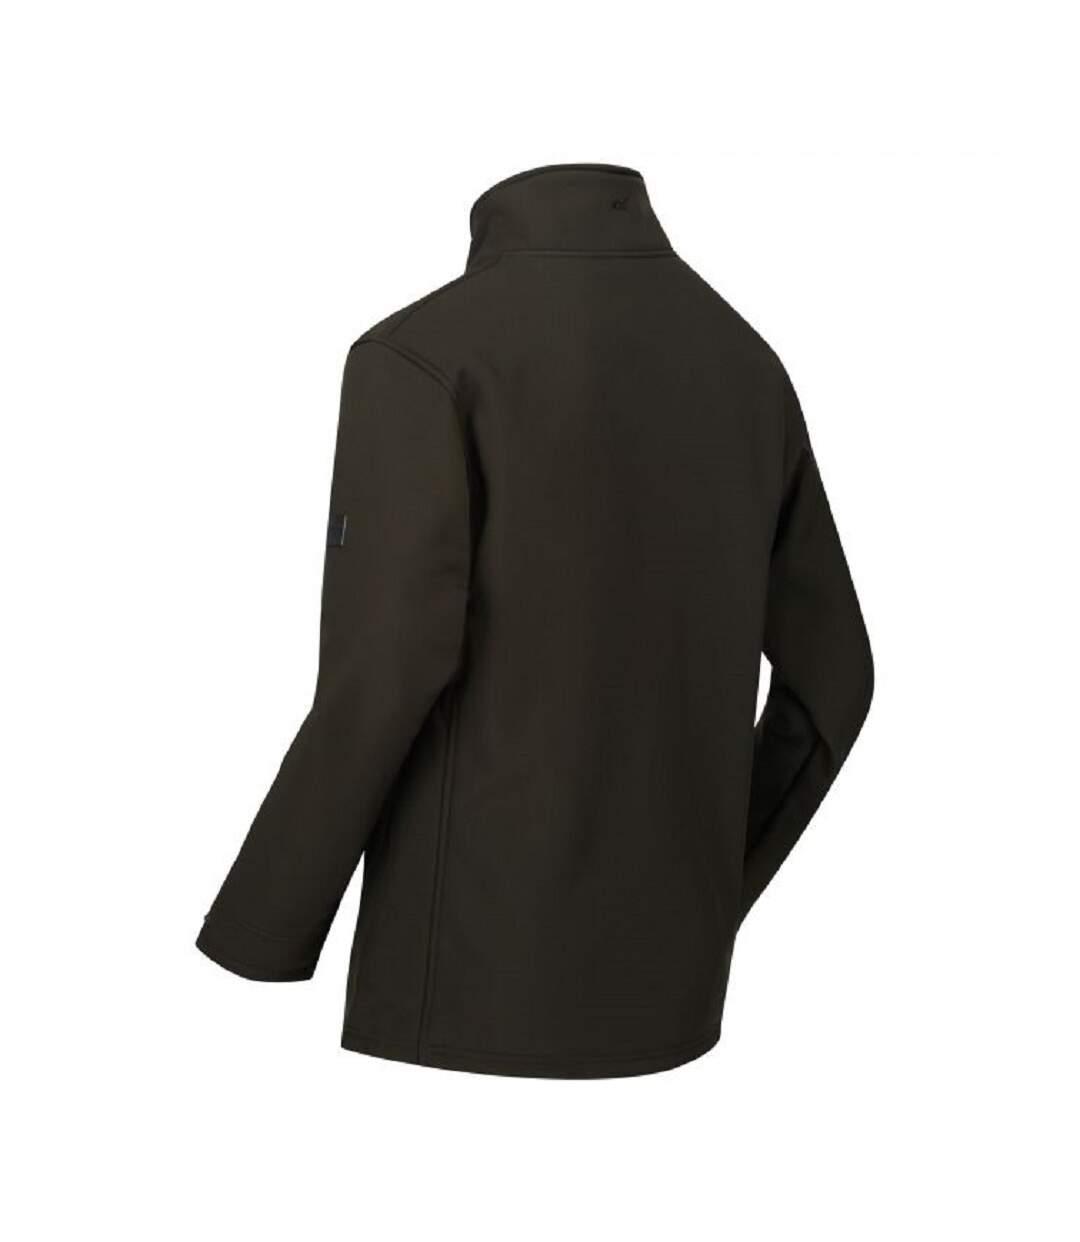 Regatta Mens Conlan Softshell Jacket (Bayleaf/Black) - UTRG4524